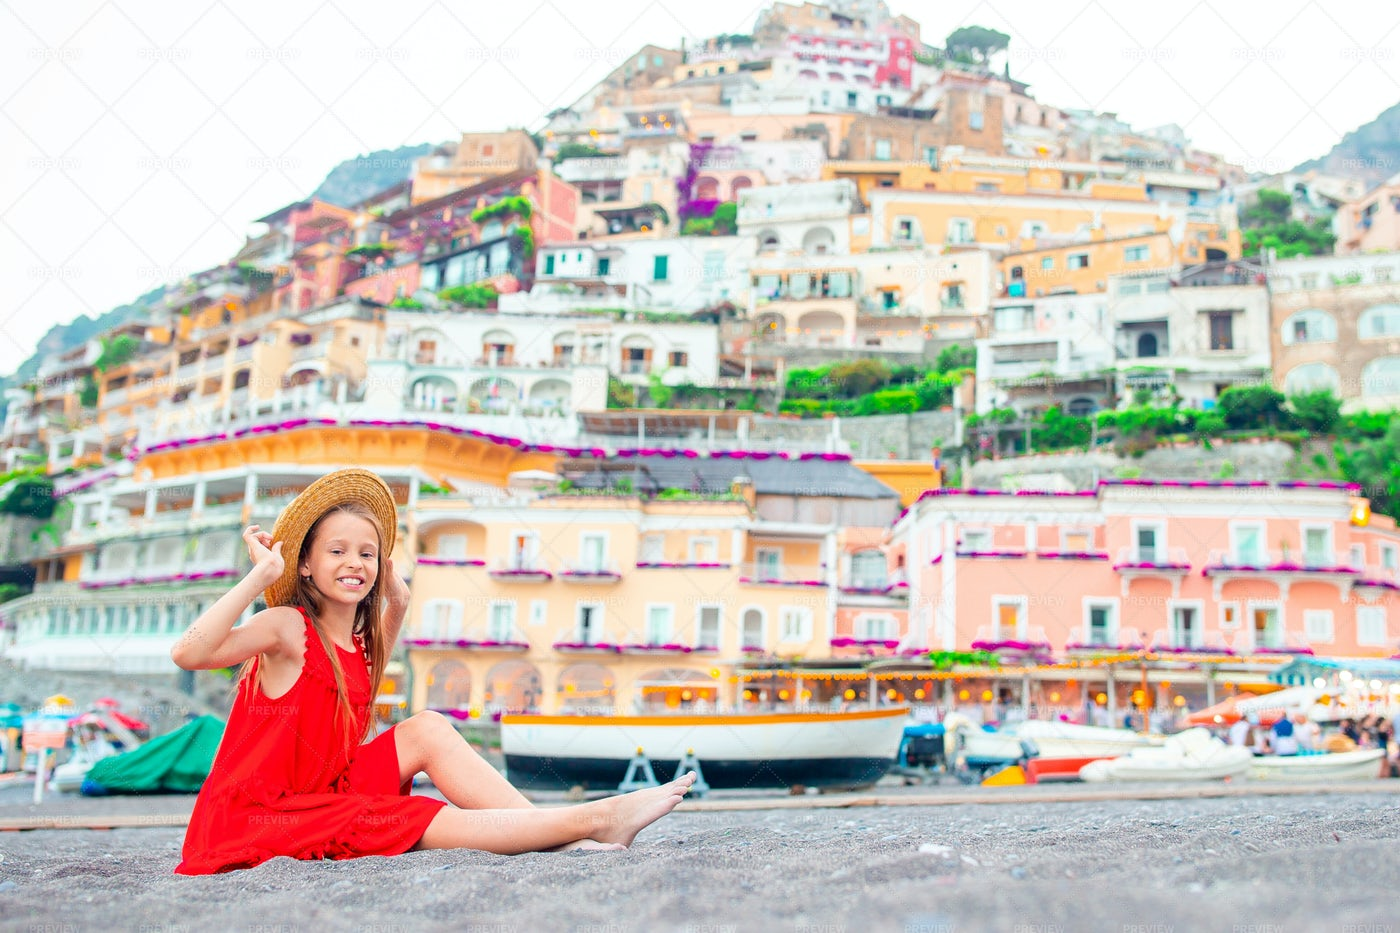 Girl On Positano Vacation: Stock Photos